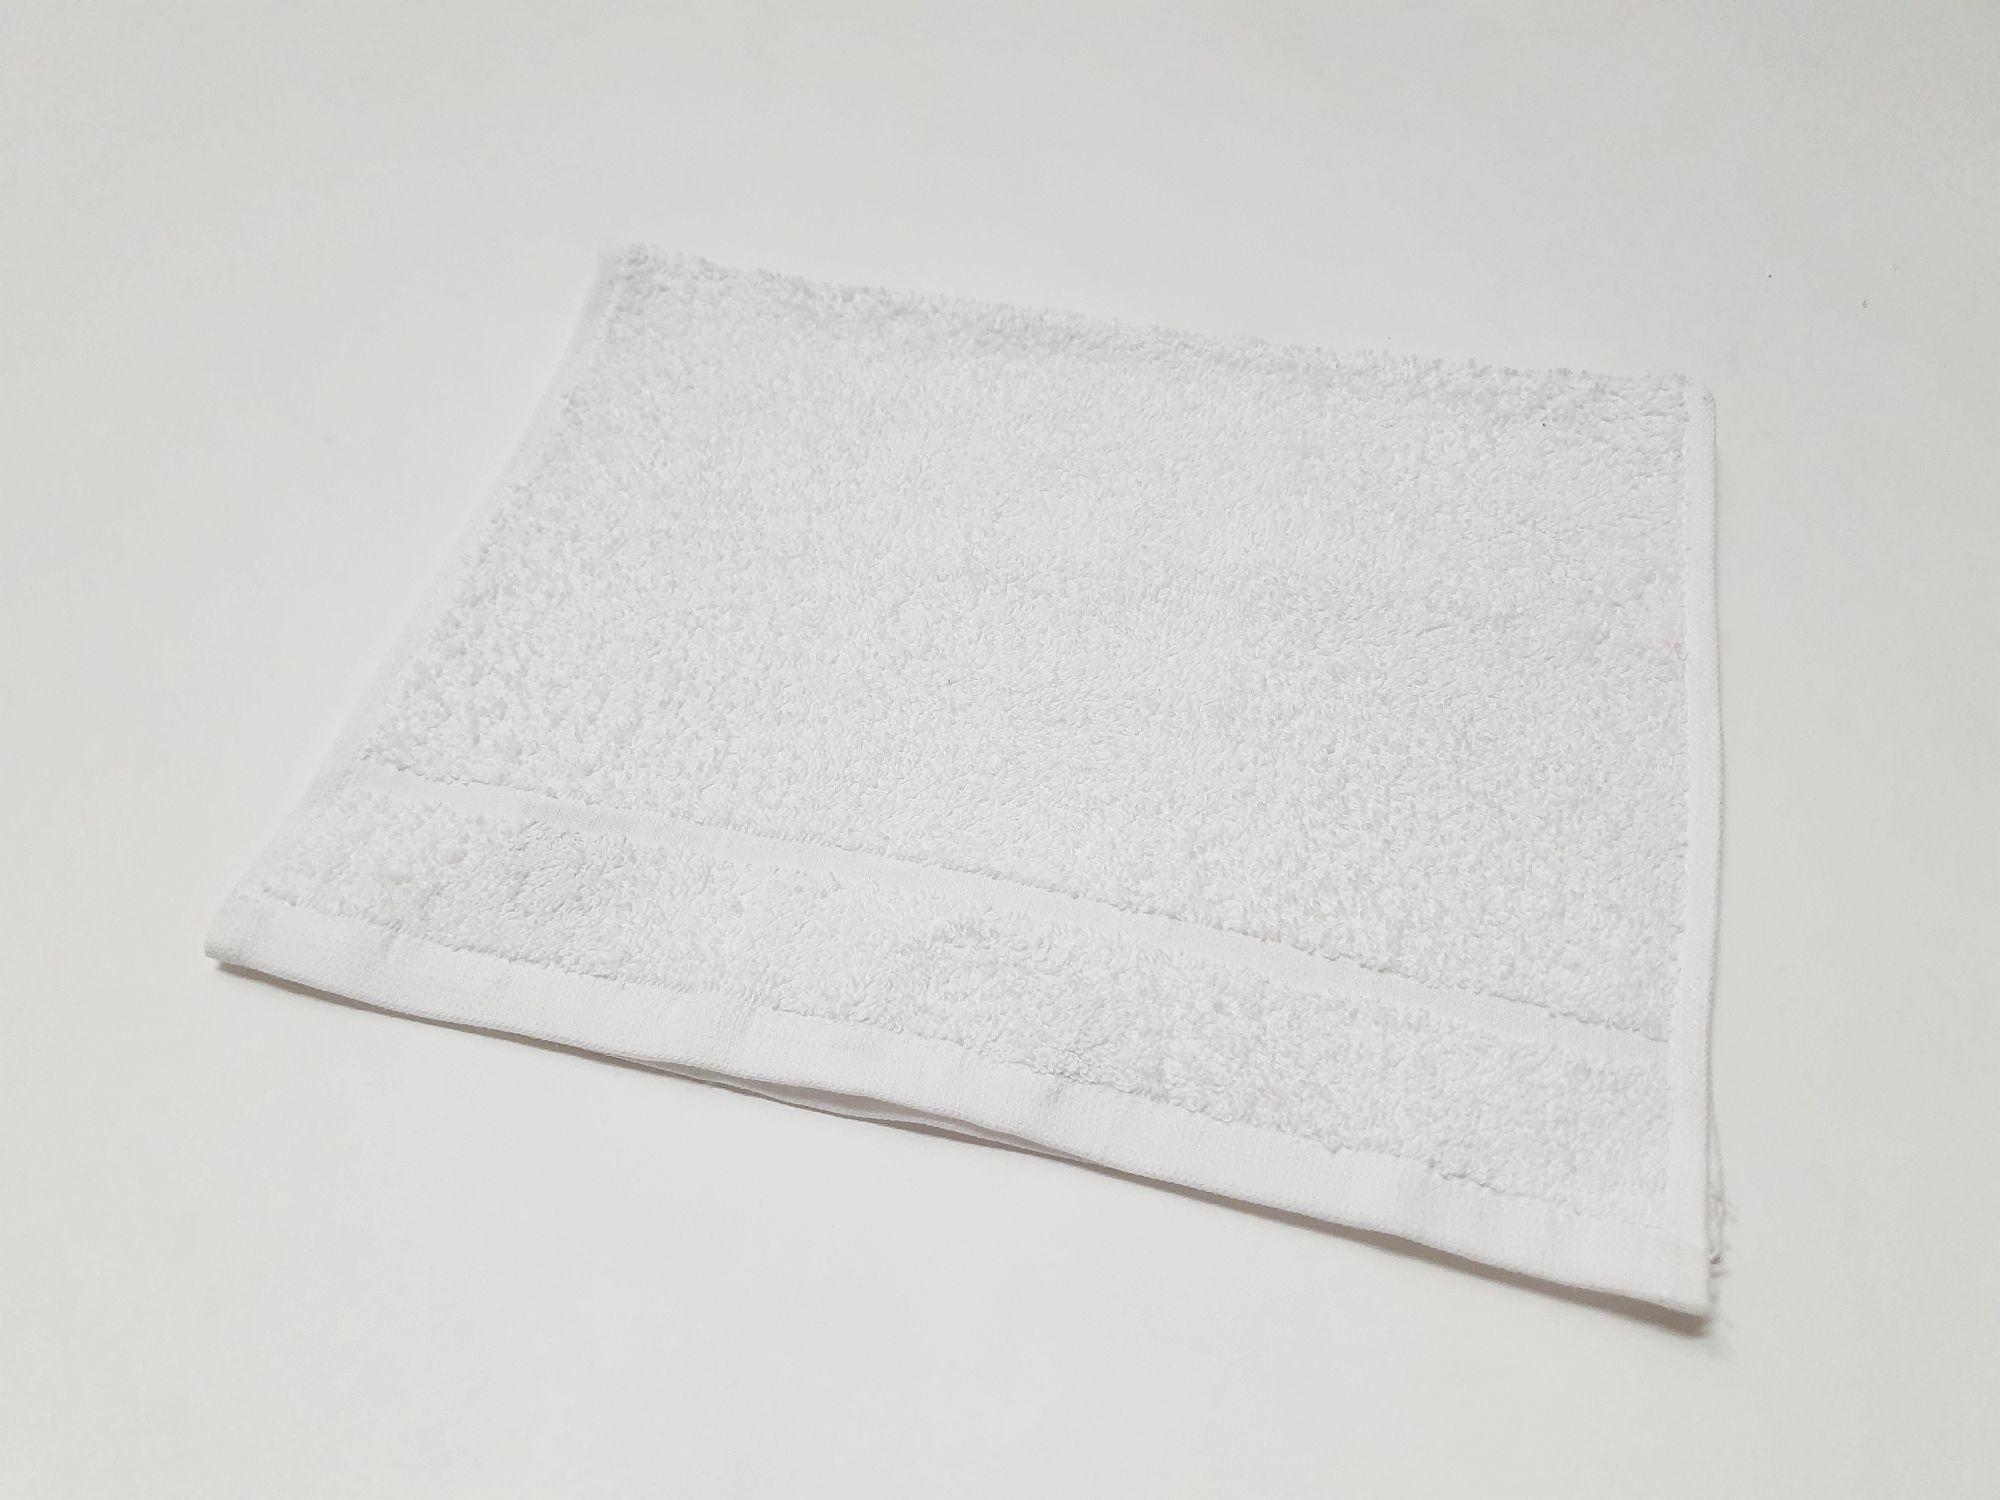 Froté ručník 30x50 - Bílý